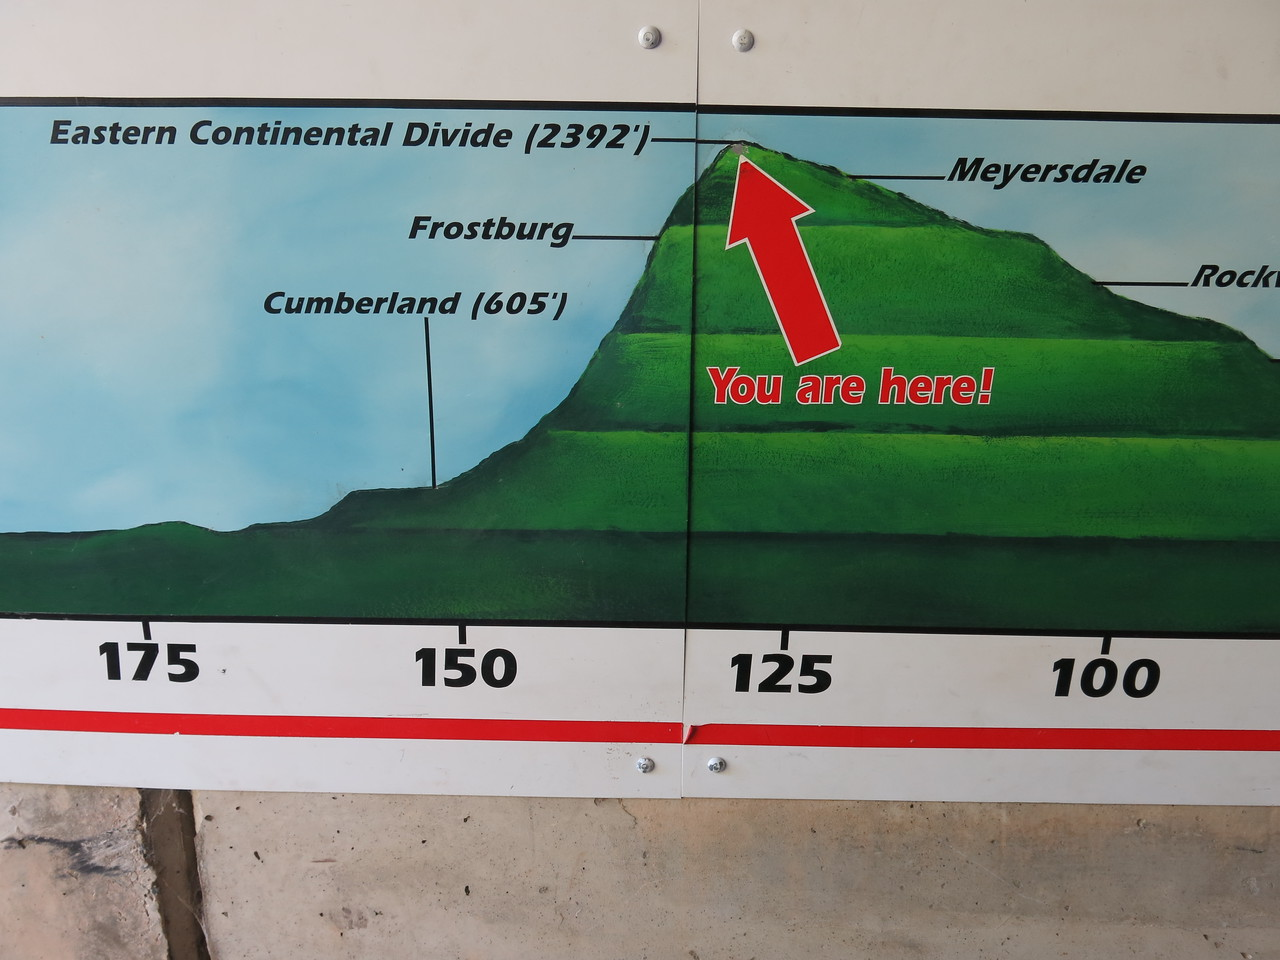 Elevation Profile for Eastern Continental Divide